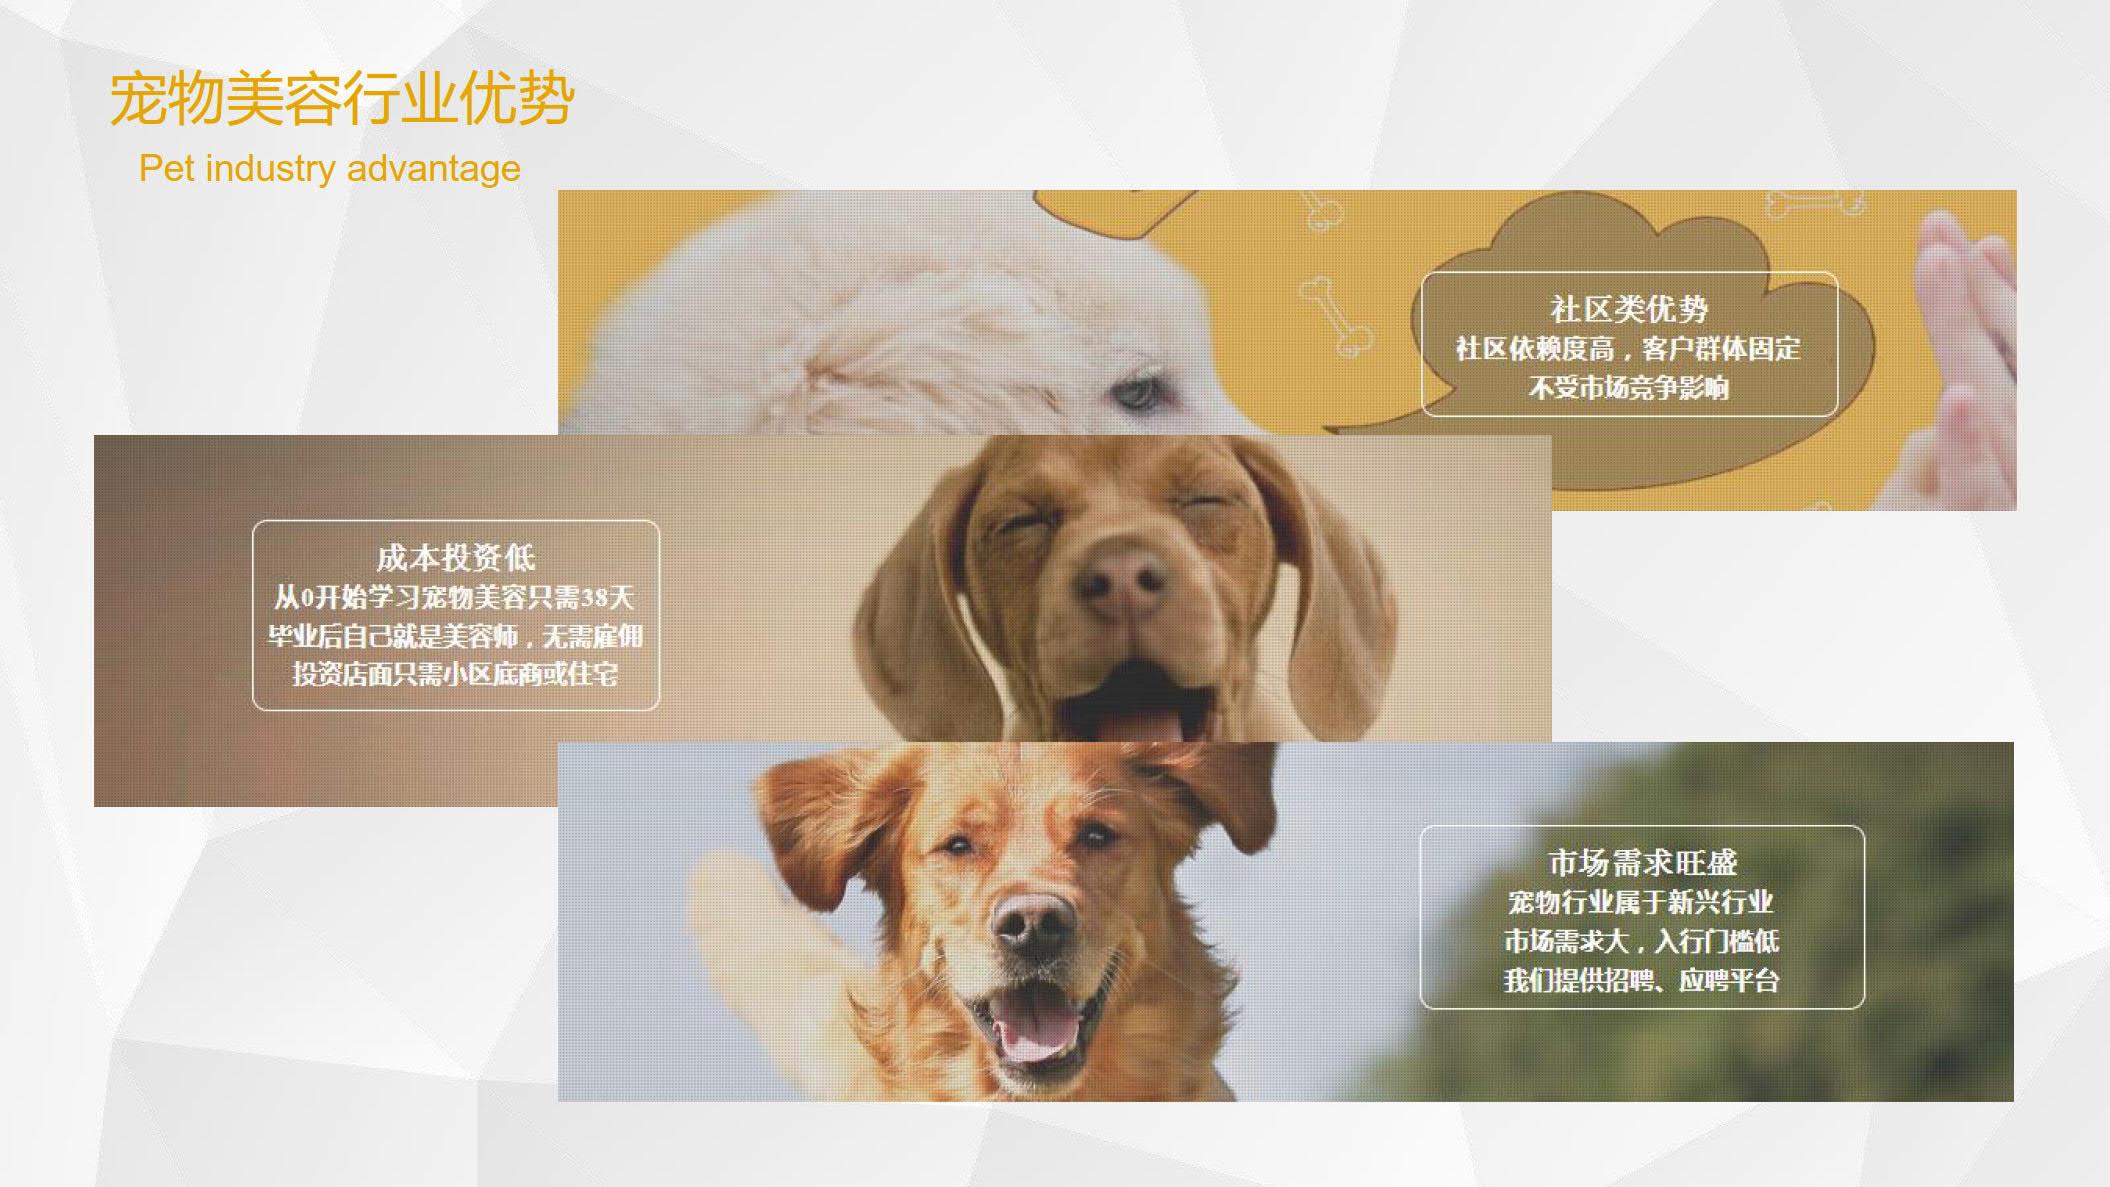 sh政轩-张燕惠_5.jpg